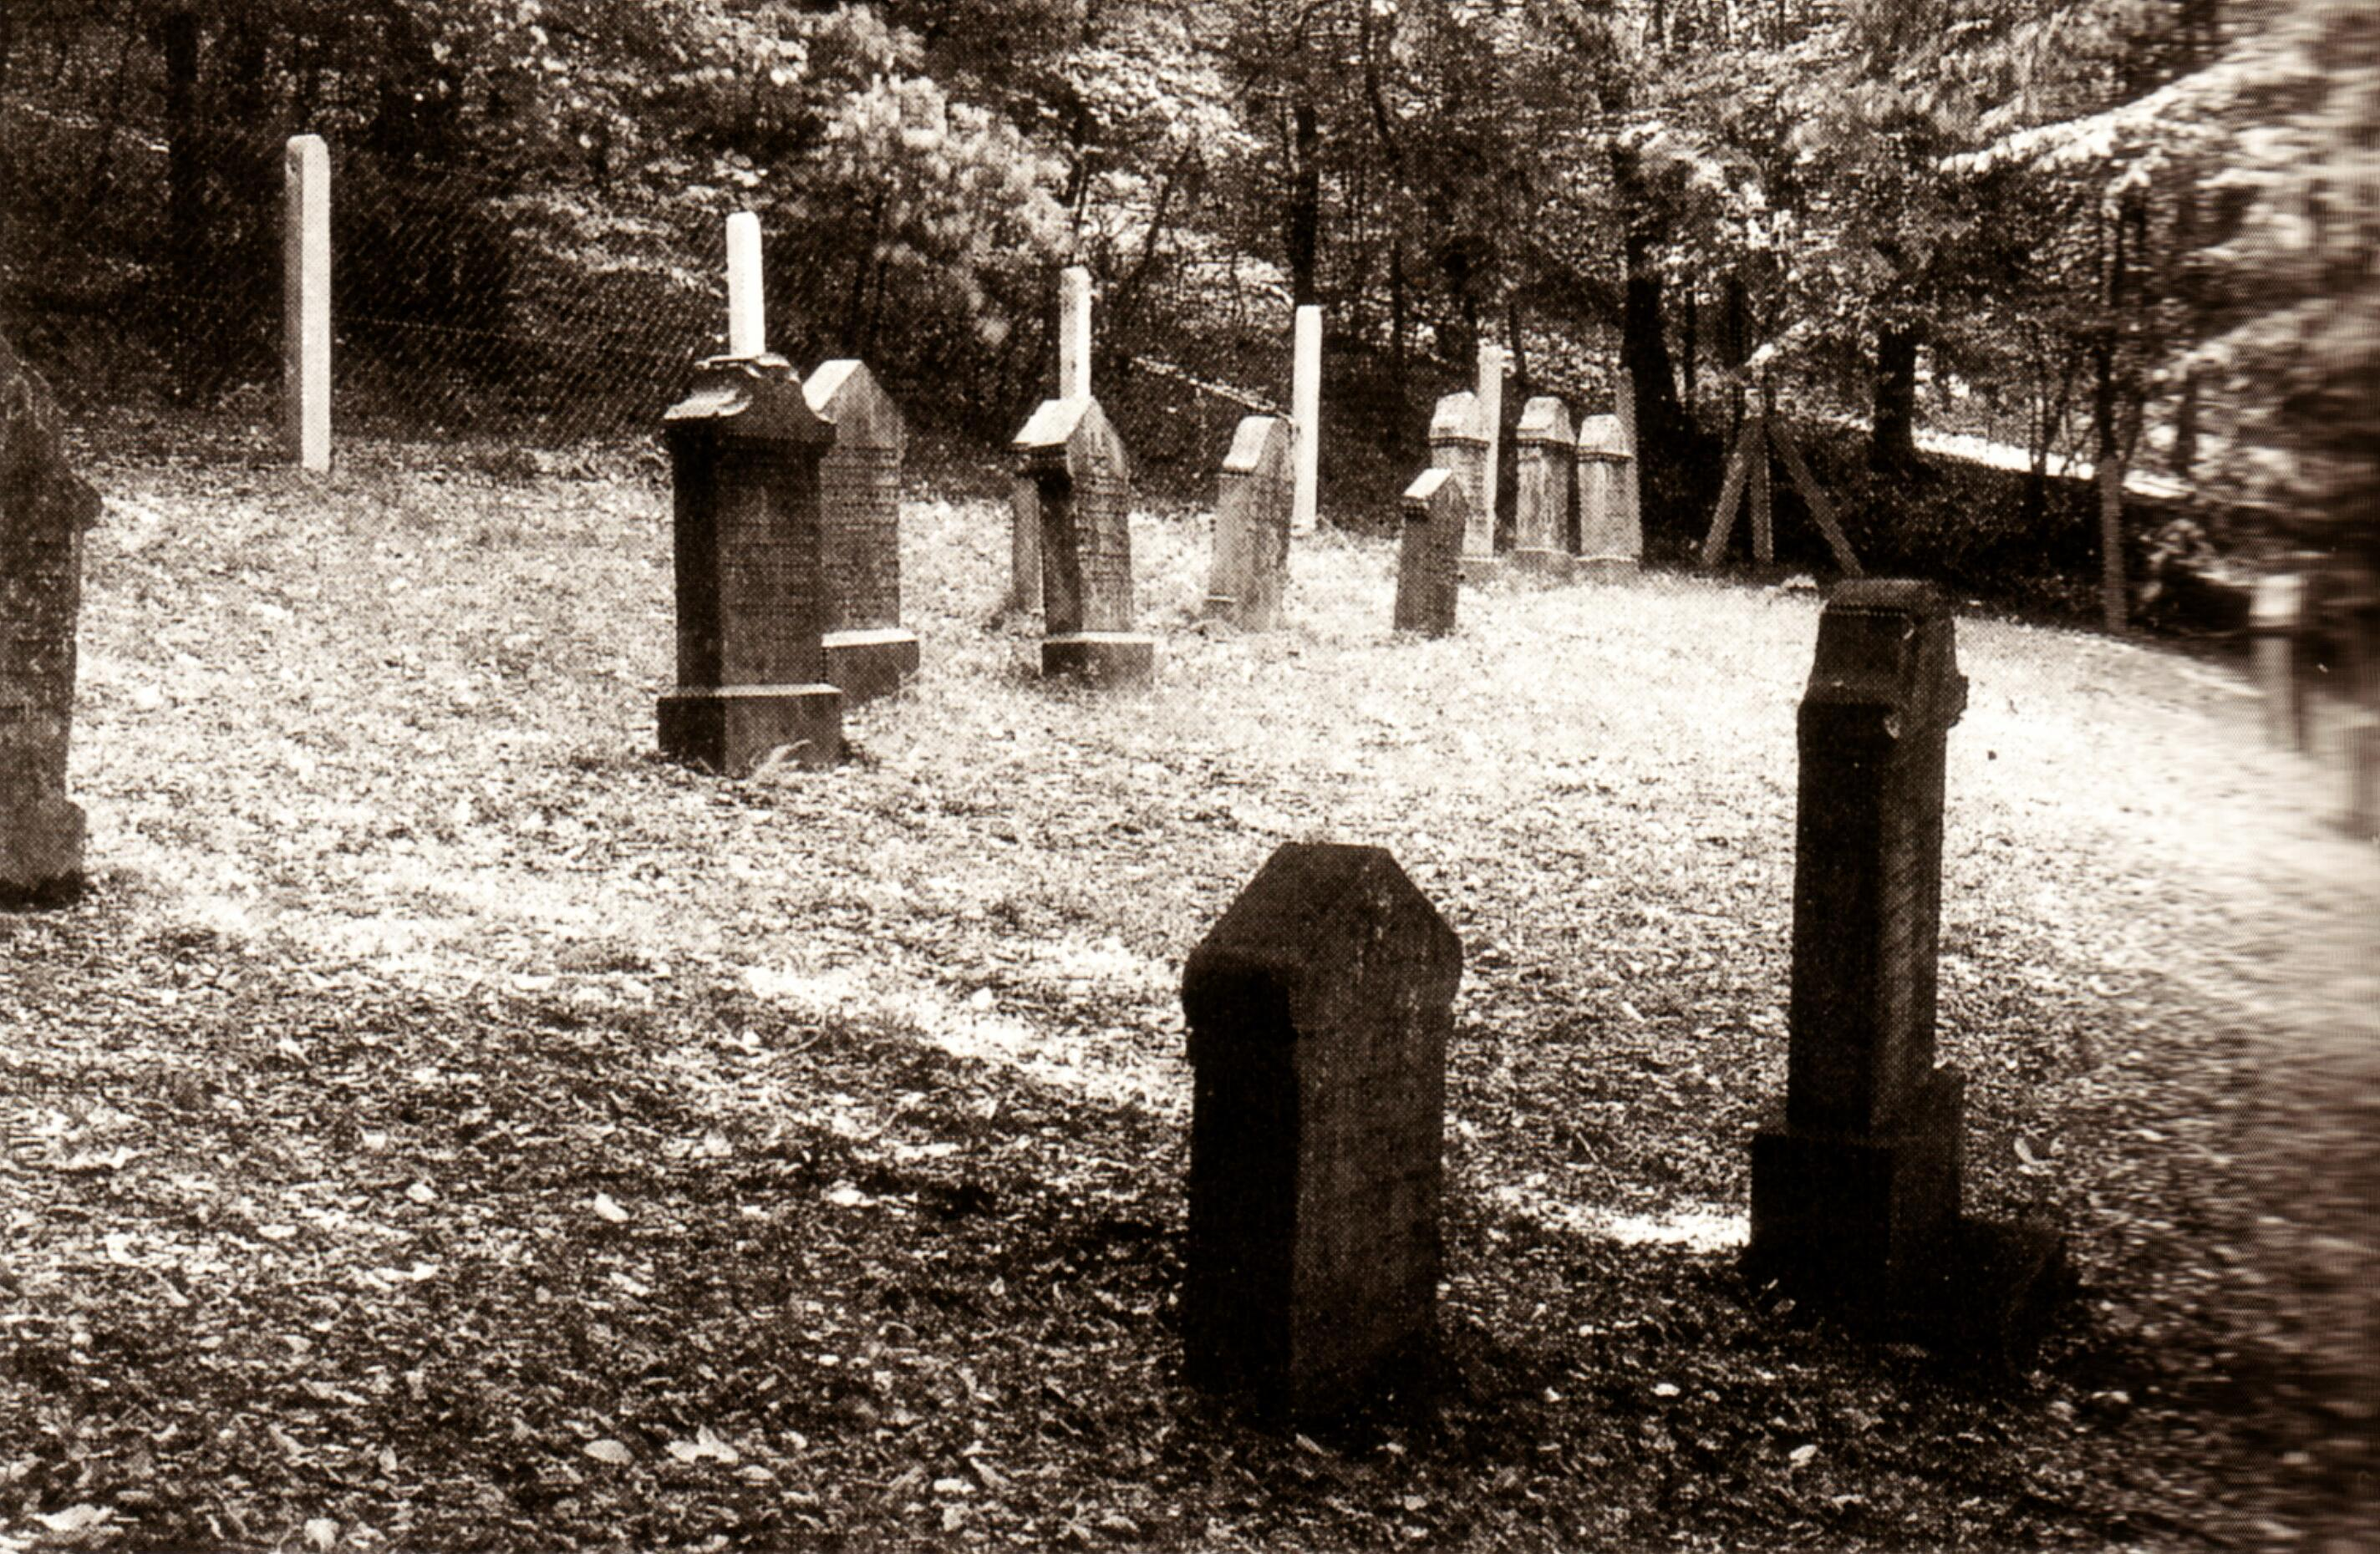 http://www.alemannia-judaica.de/images/Images%20394/Bischhausen_Friedhof%20010.JPG